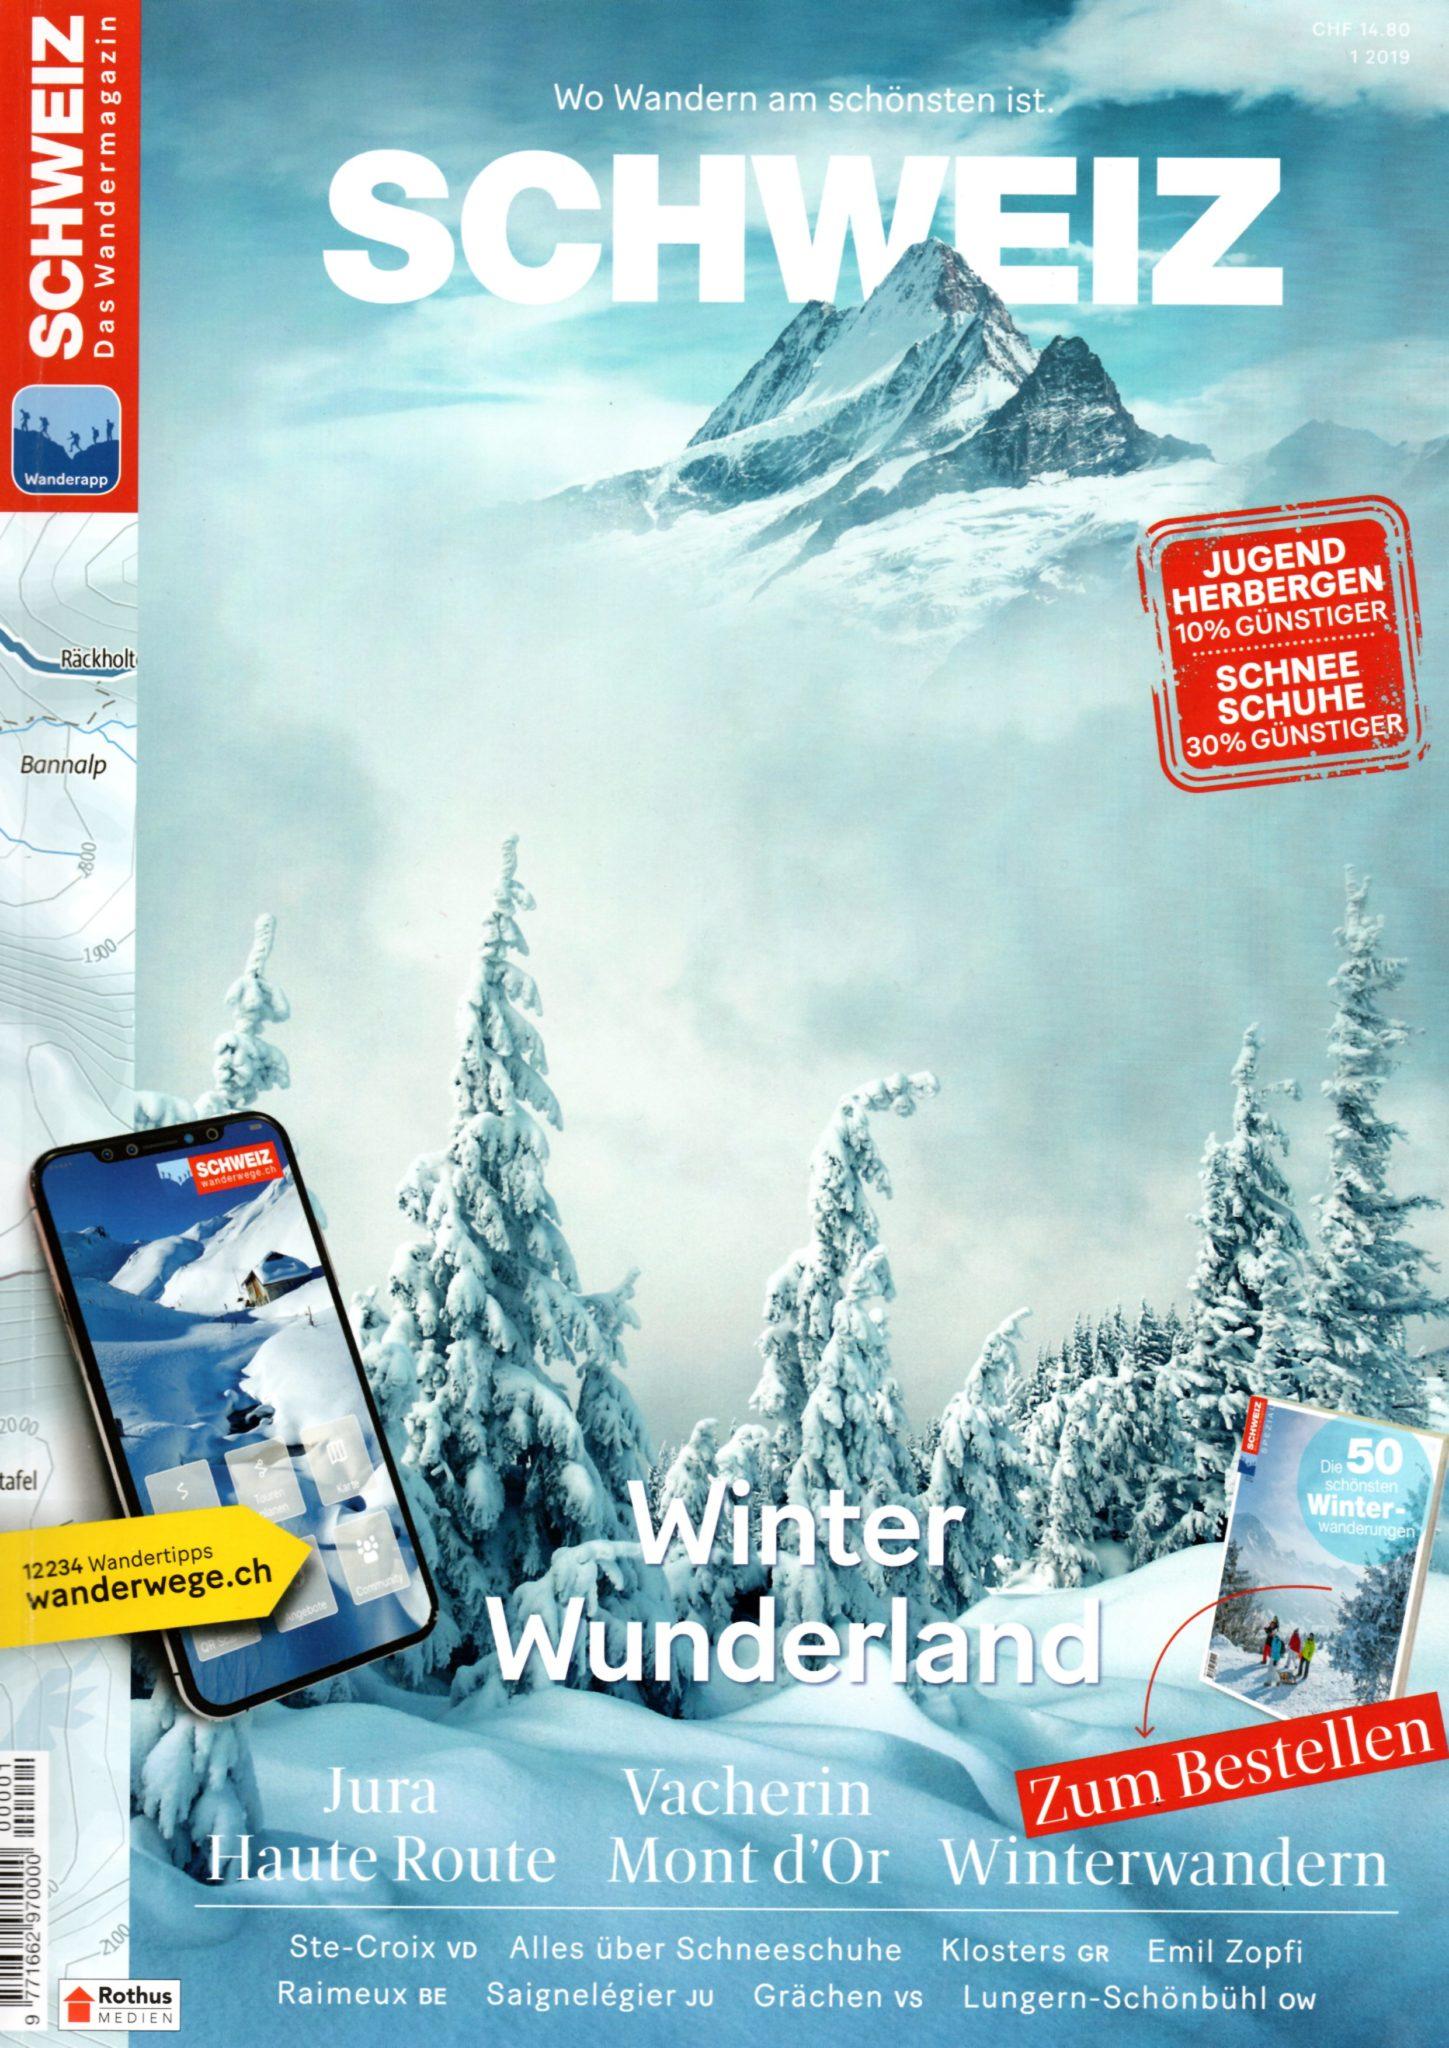 Wandermagazin Titelblatt 190120181217_11523438